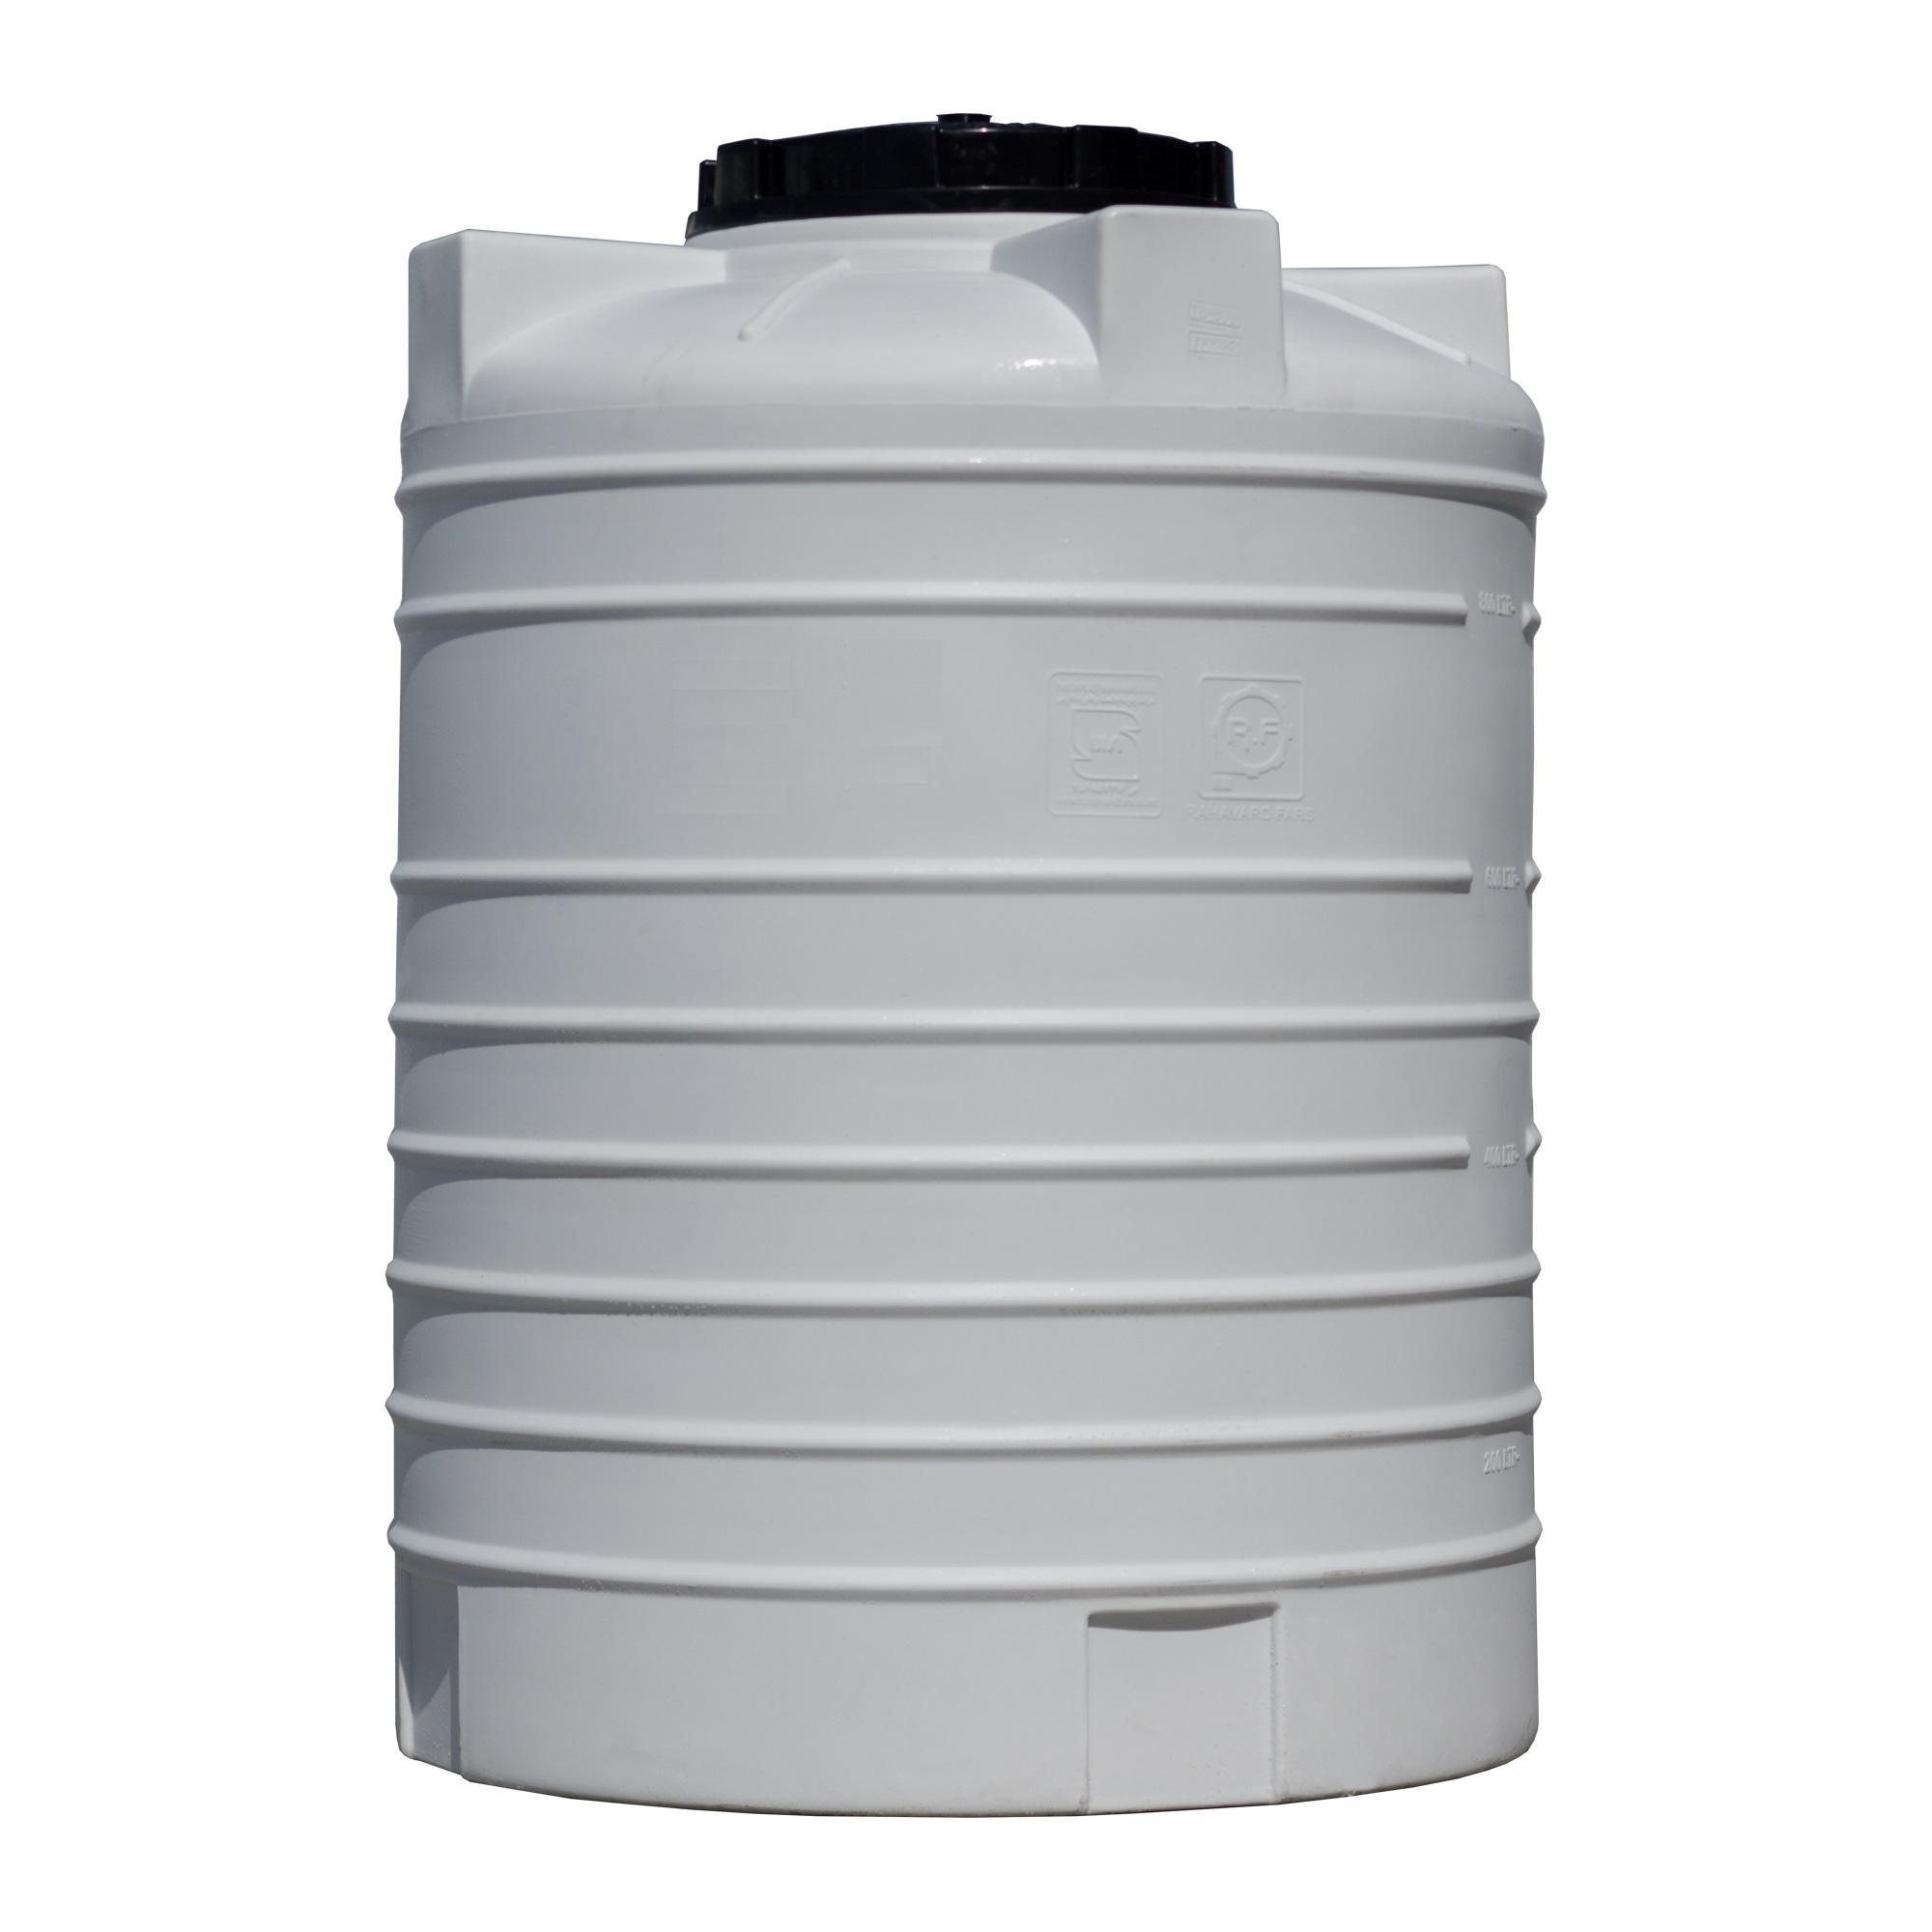 قیمت                                      مخزن آب رهاورد فارس کد 4870 حجم 500  لیتر